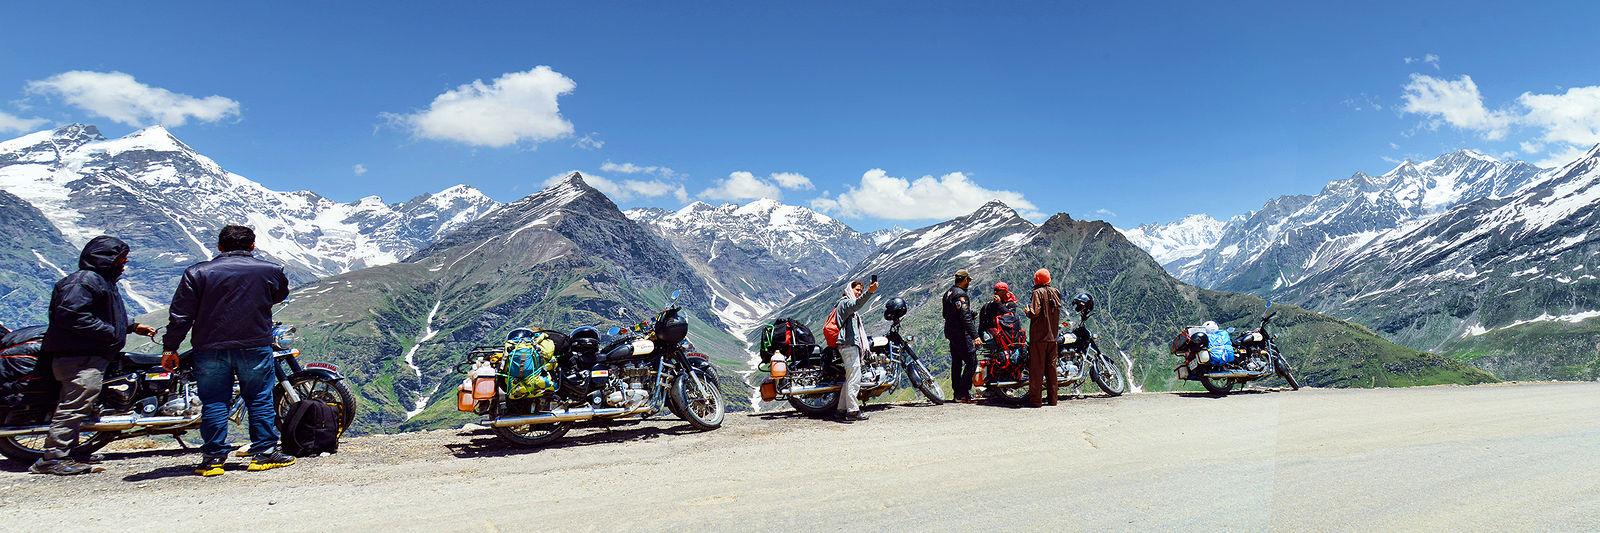 Ivan Aleshin. NH21 and other Himalayan Roads. 0003